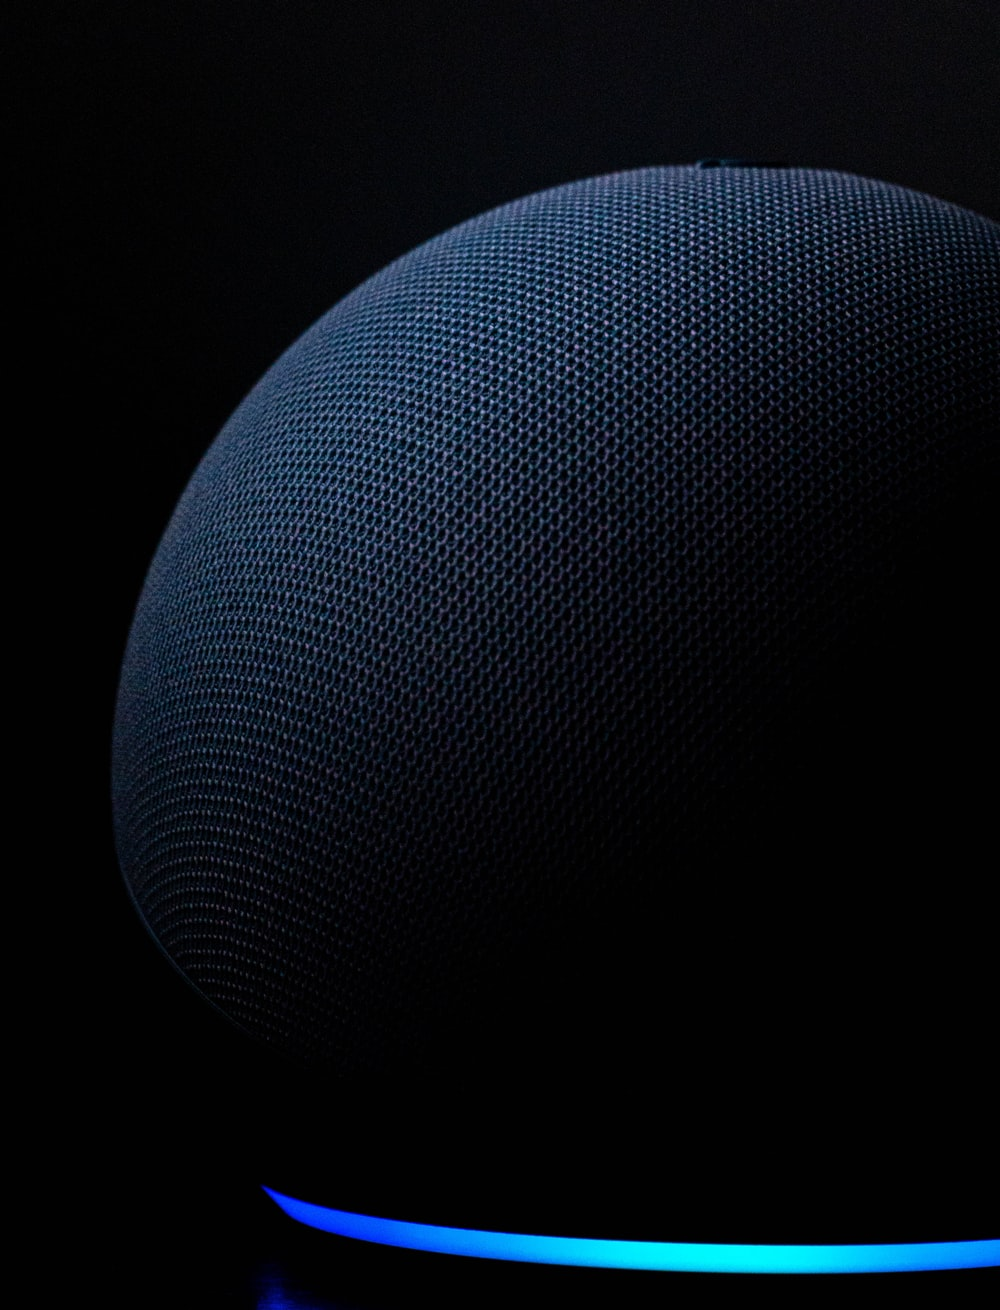 blue round textile on black background